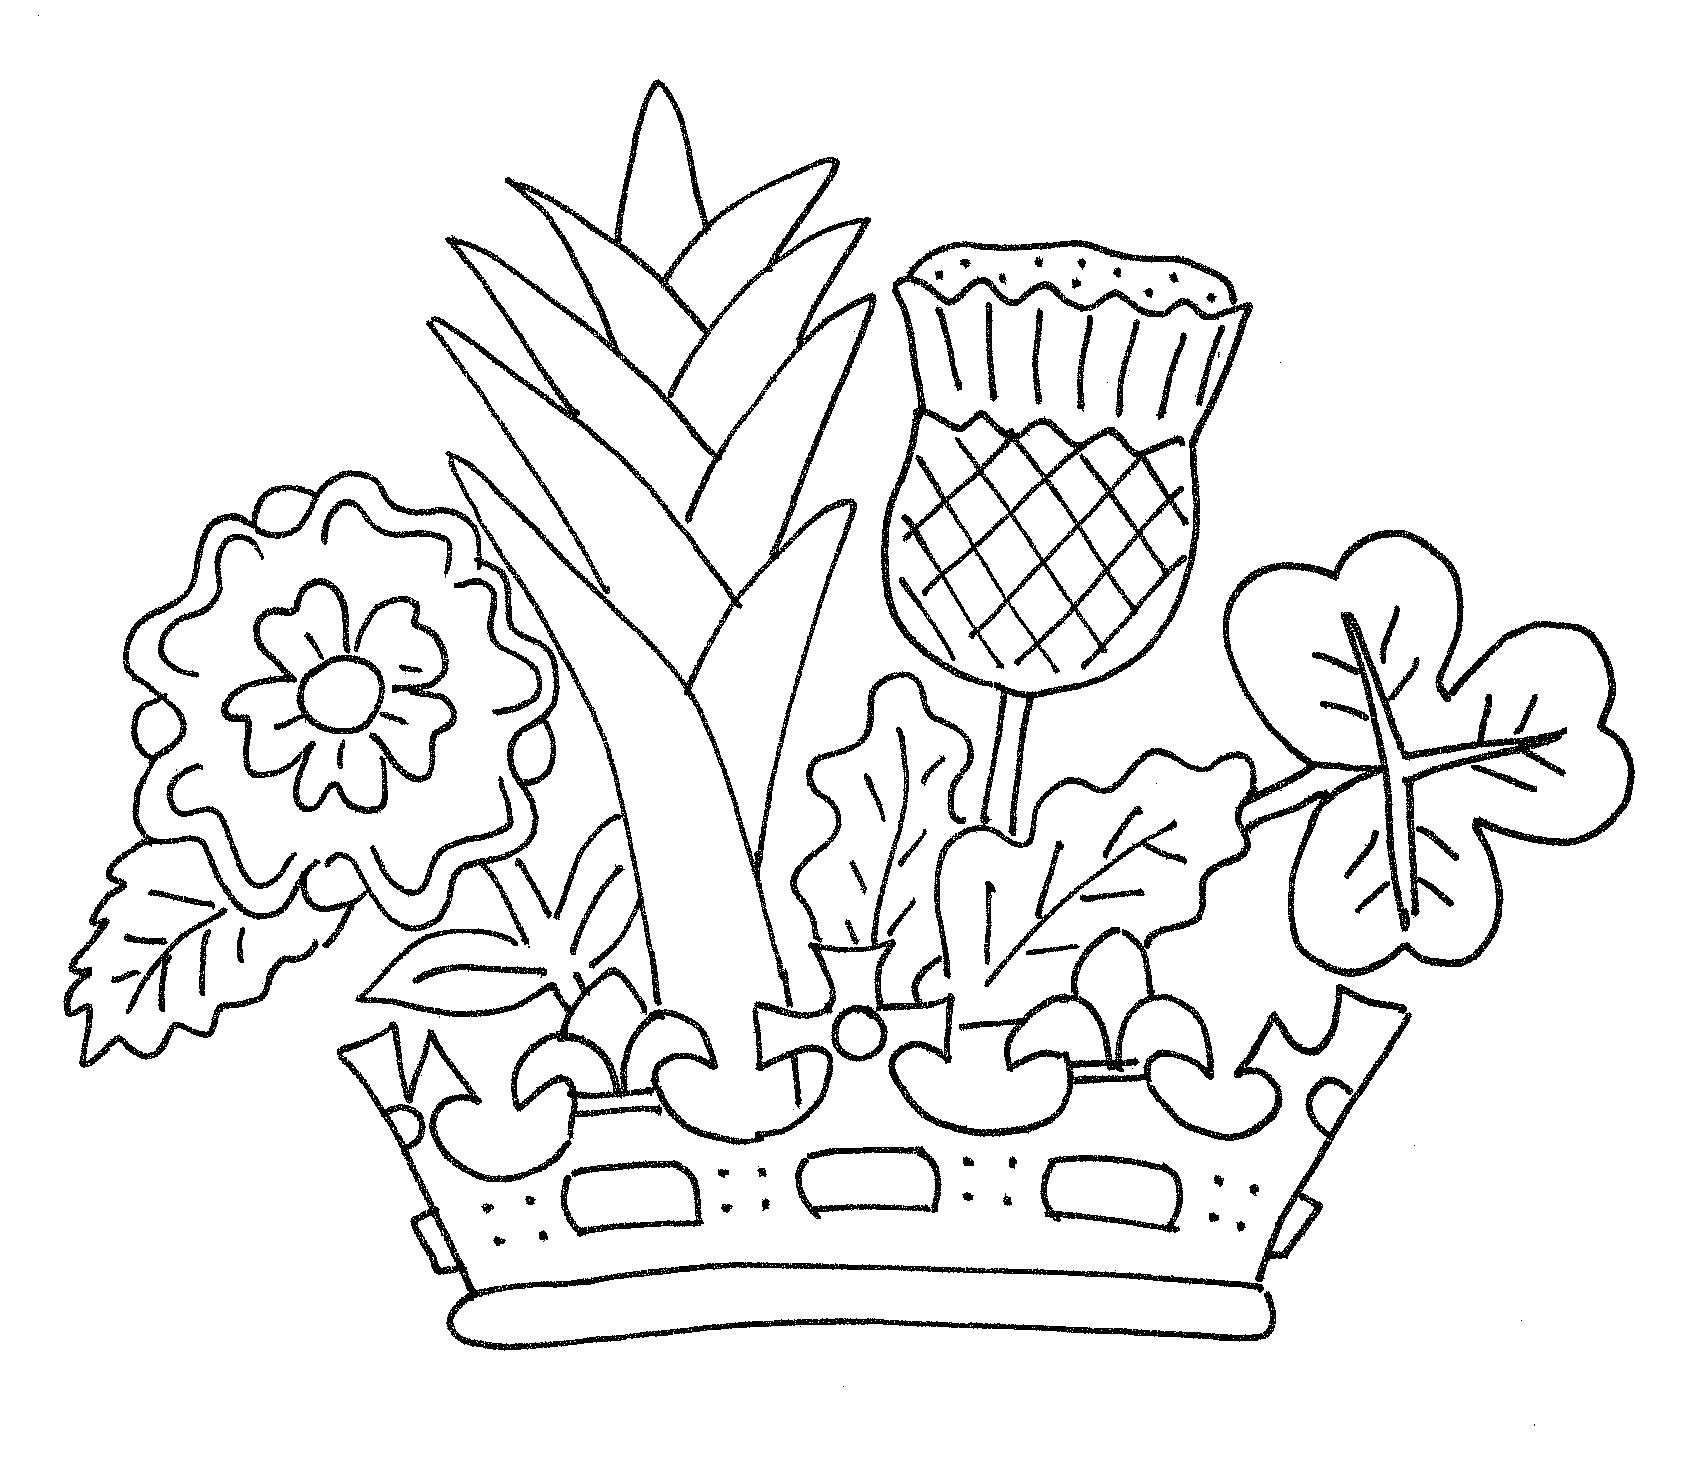 April 2017 Iron On Transfer — Dandelion Designs